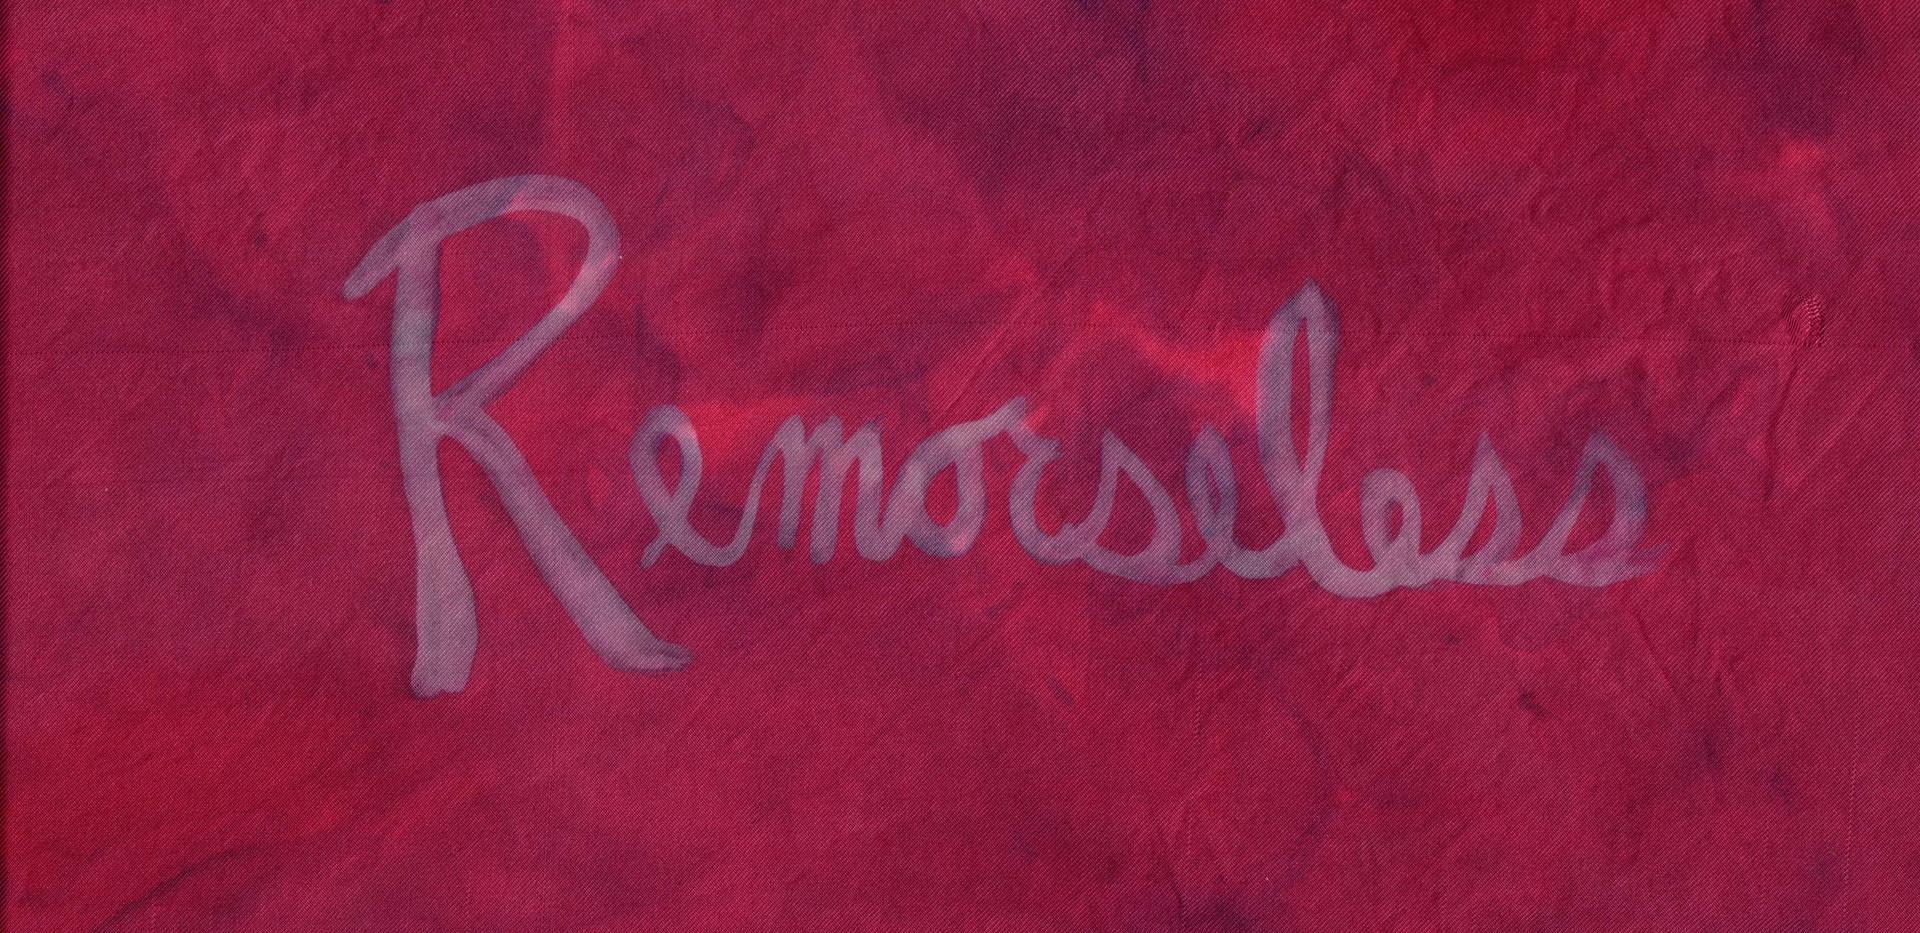 Textile Art 'Remorseless'